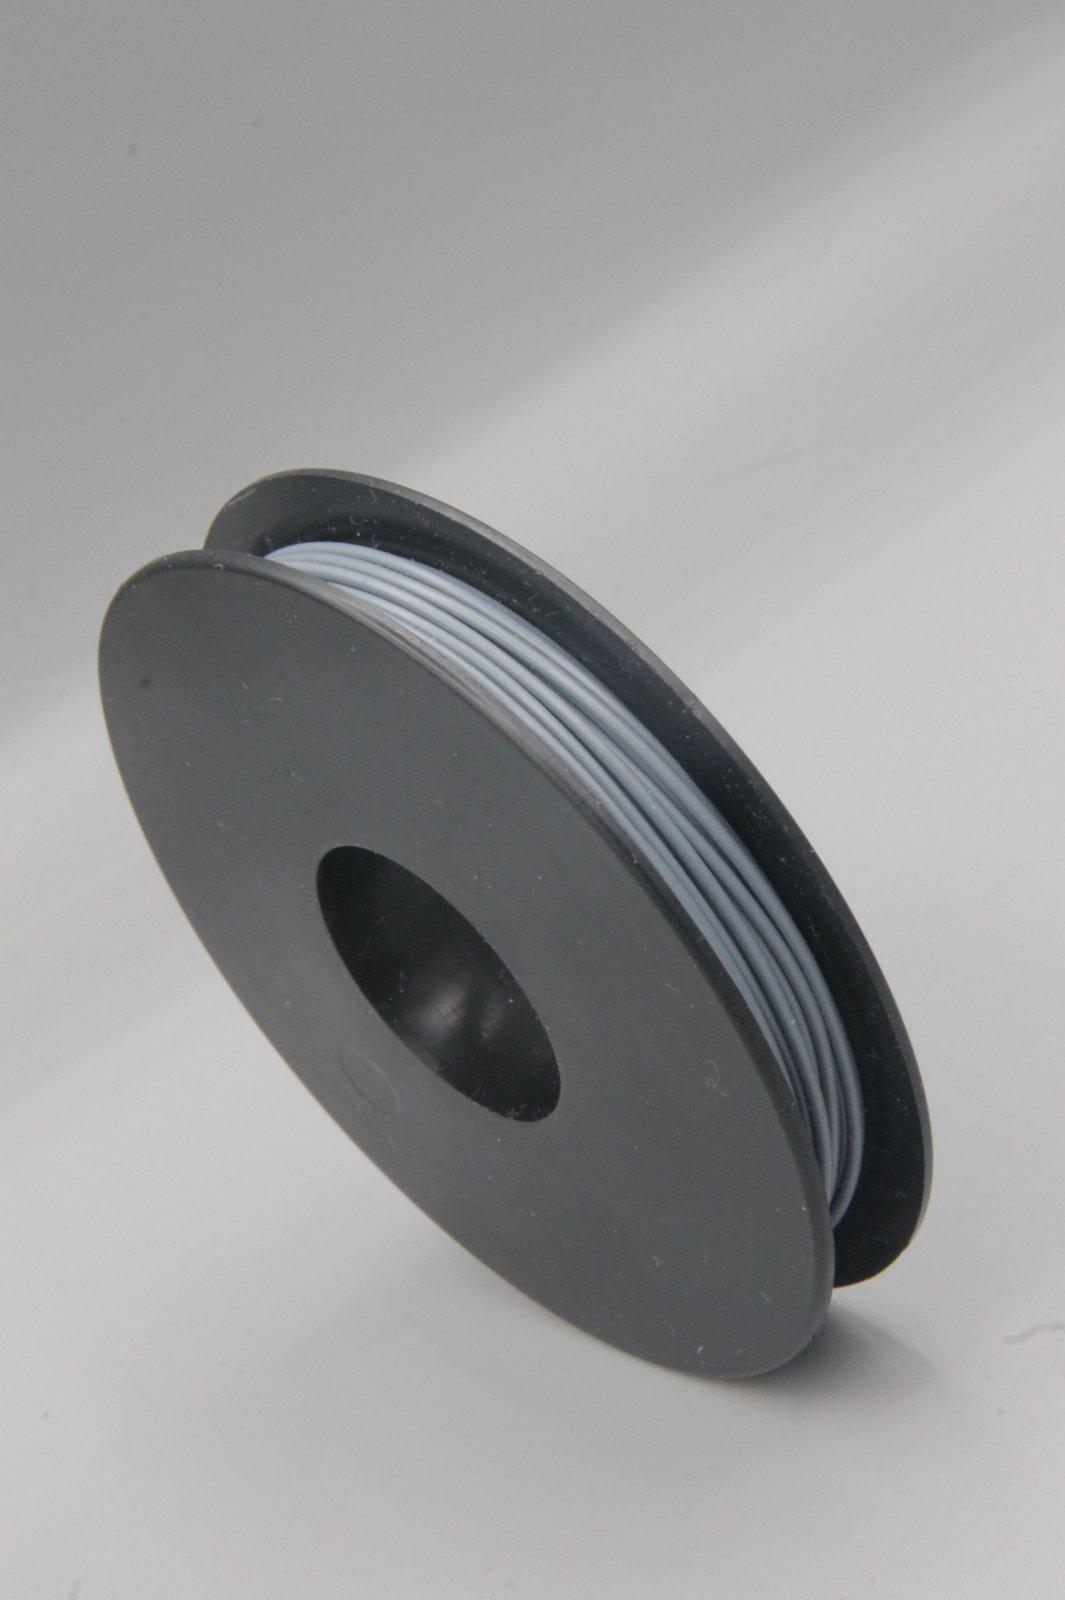 25 m Spule LIYV Kabel Litze flexibel  grau 0,25 mm² Kupferlitze Kabel